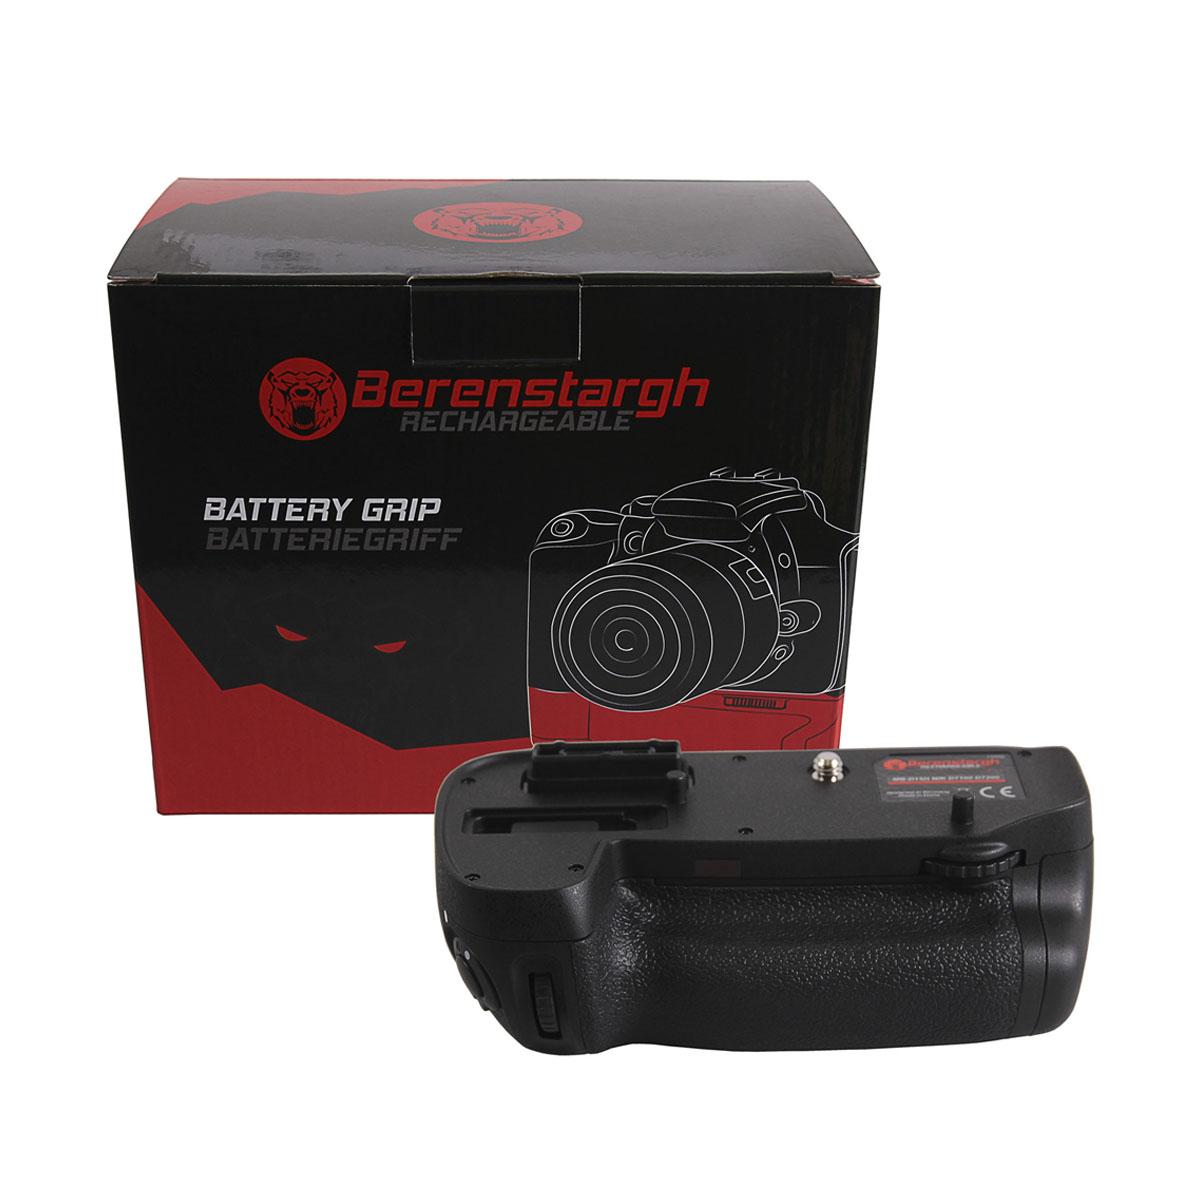 Berenstargh Batteriegriff für Nikon D7100/D7200